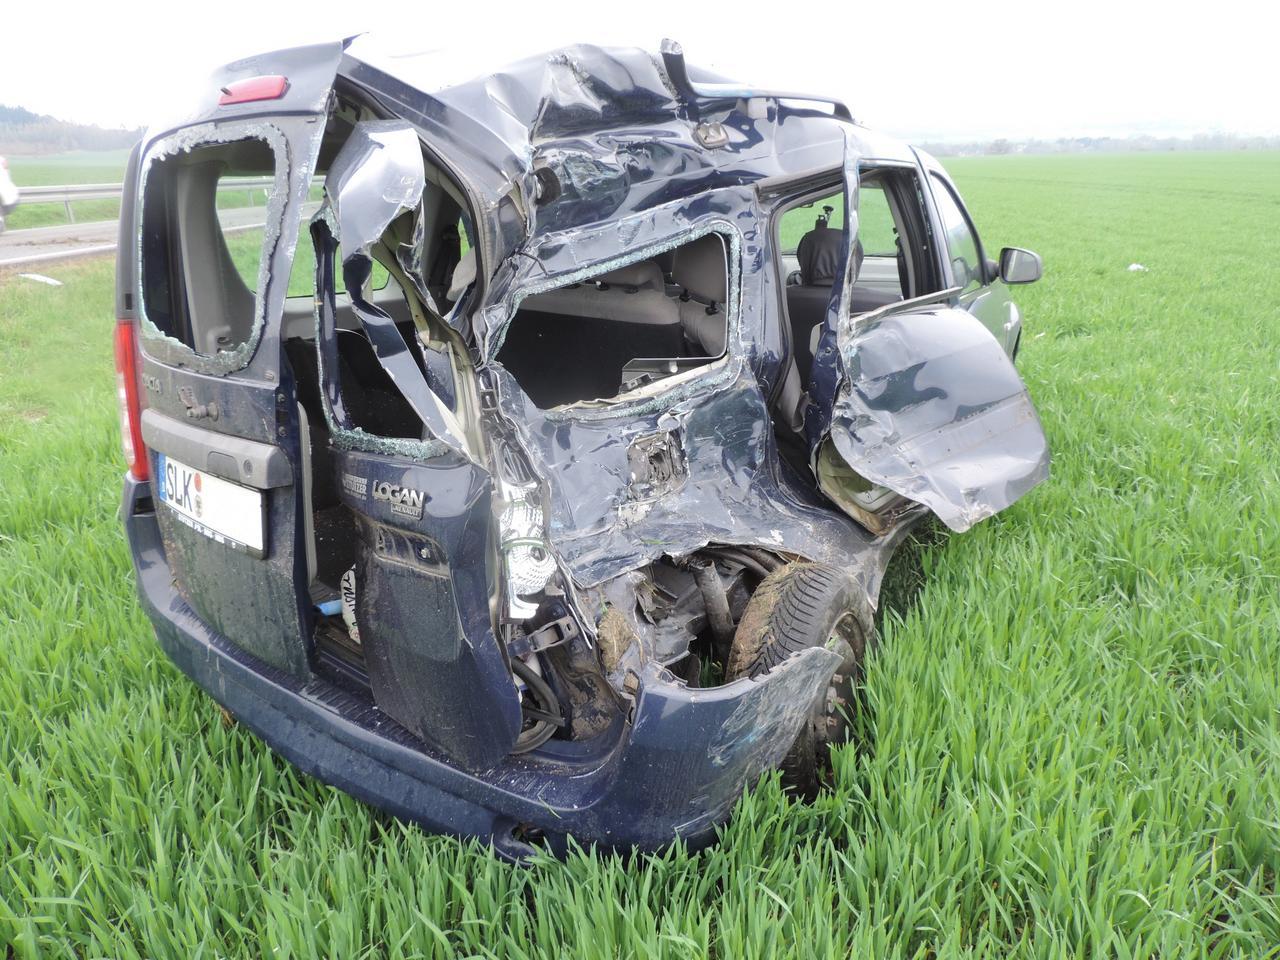 Lkw katapultiert Dacia auf Acker